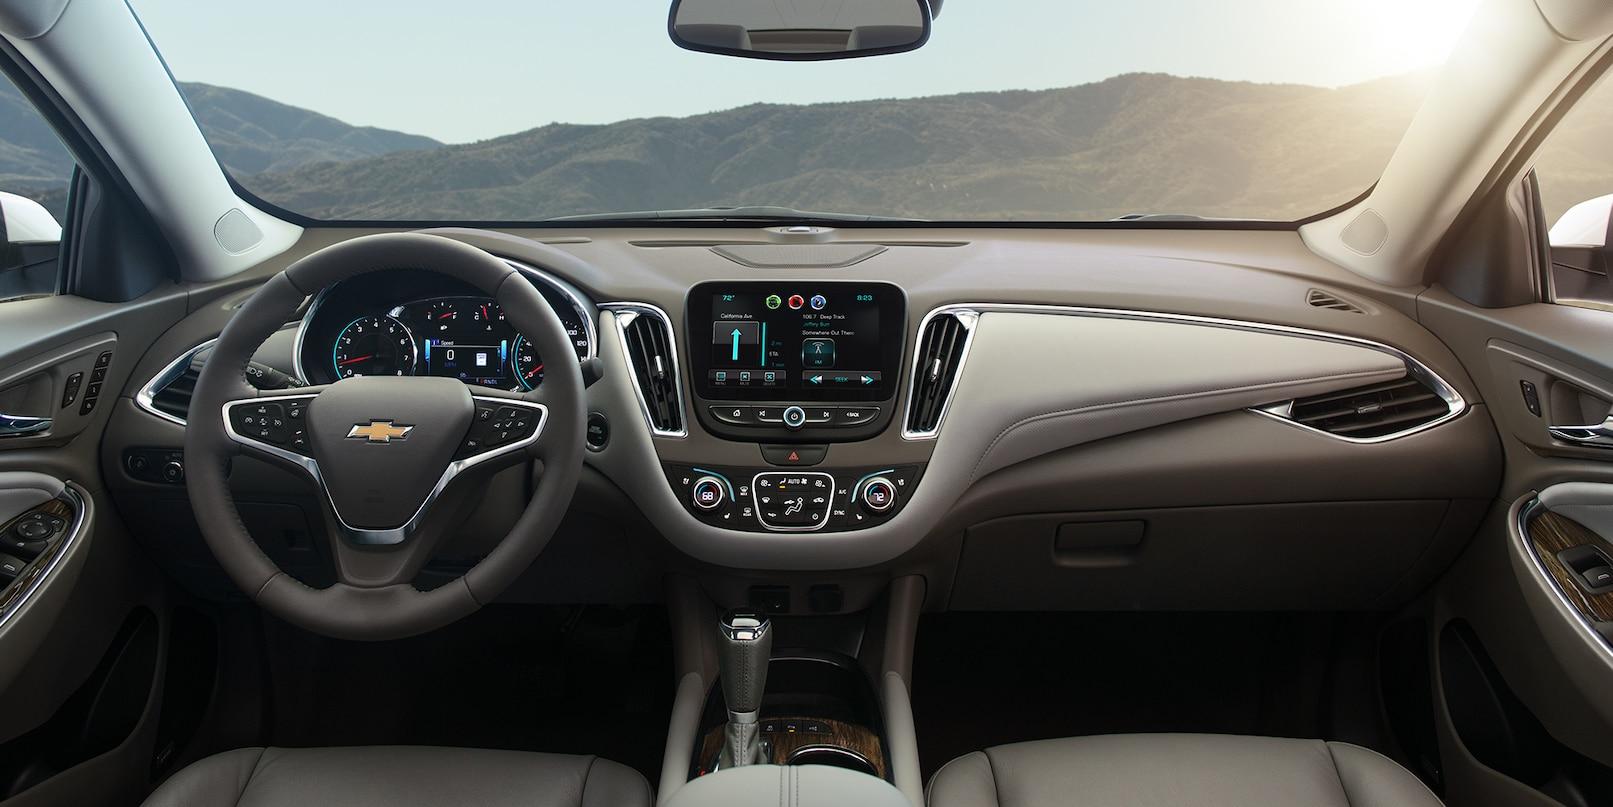 Interior of the 2018 Chevrolet Malibu